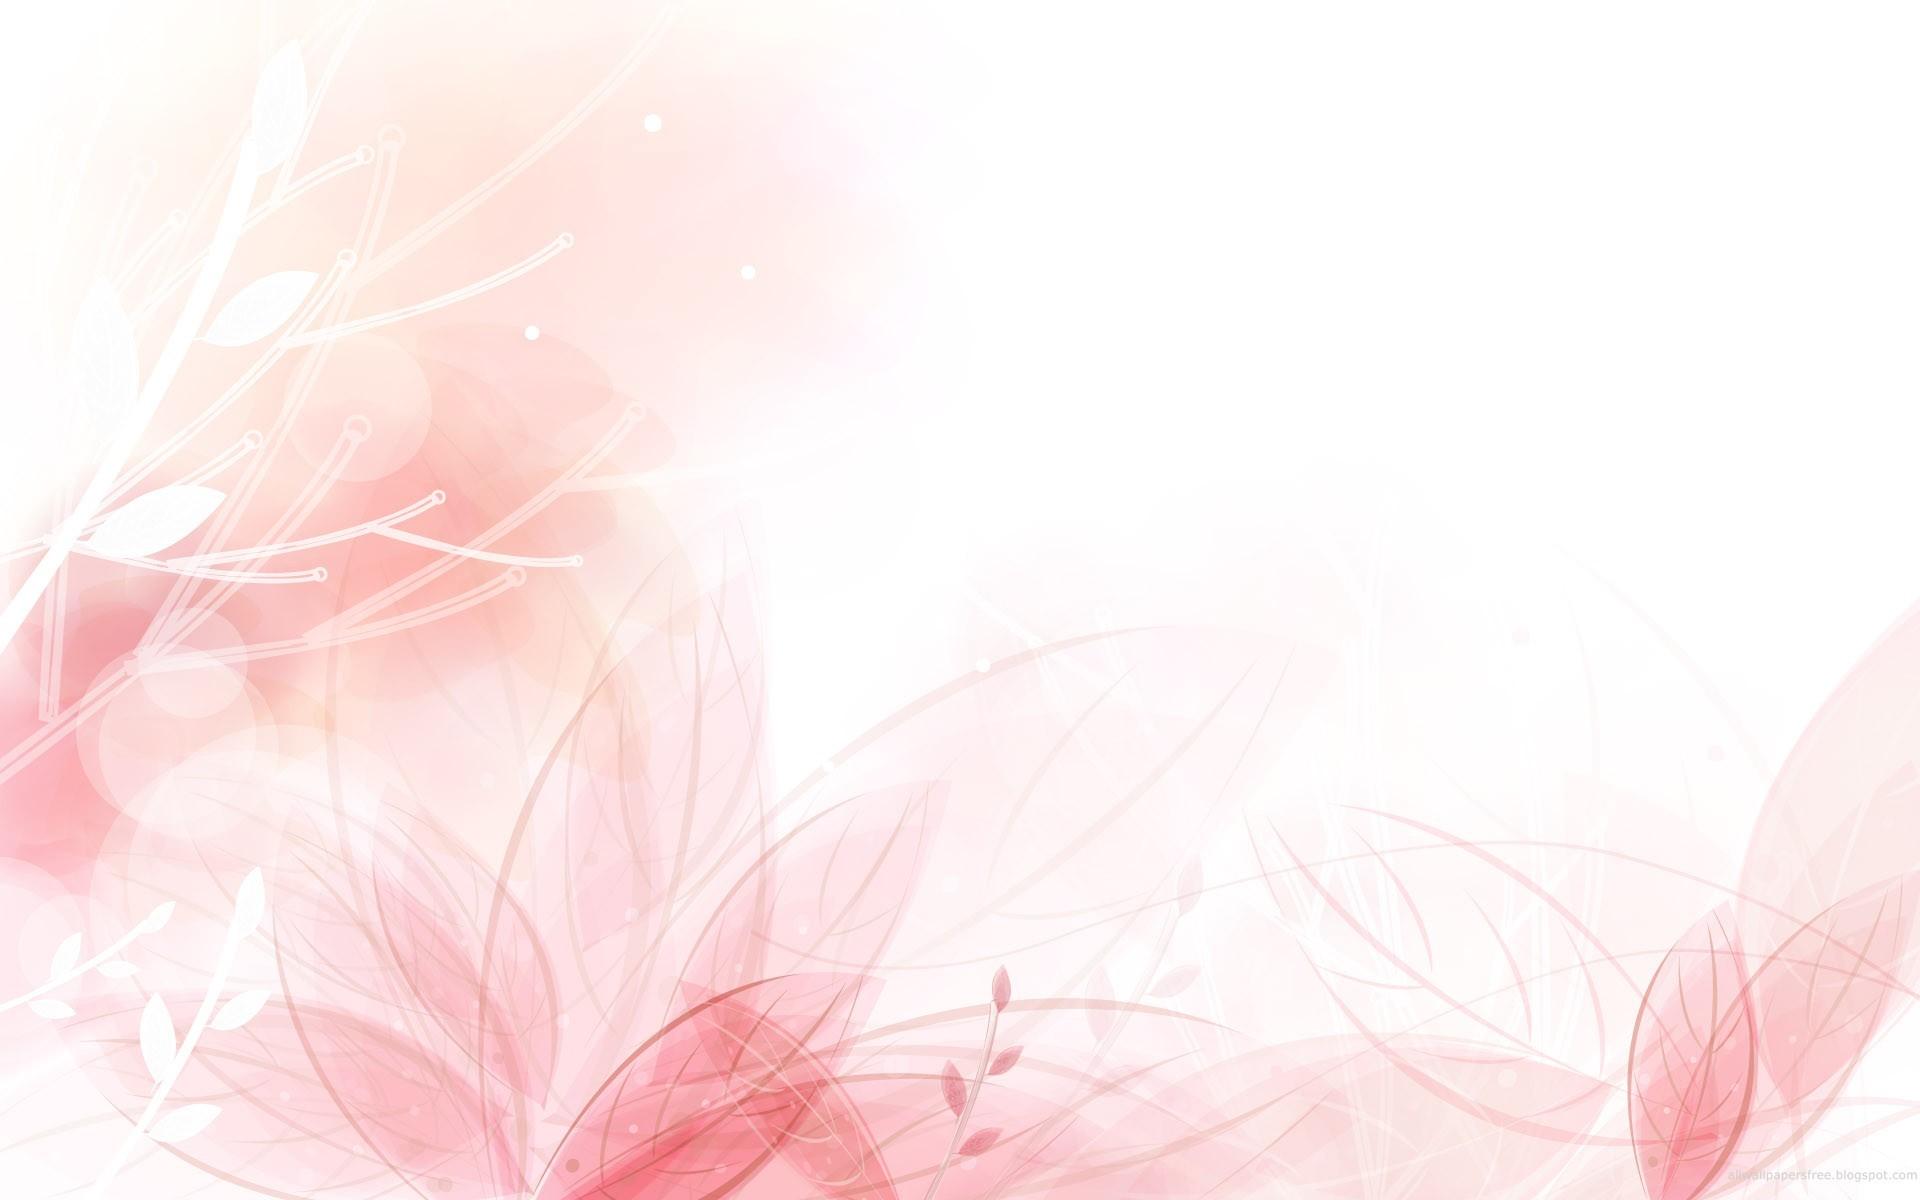 light pink and white wallpaper 2016 – White Brick Wallpaper